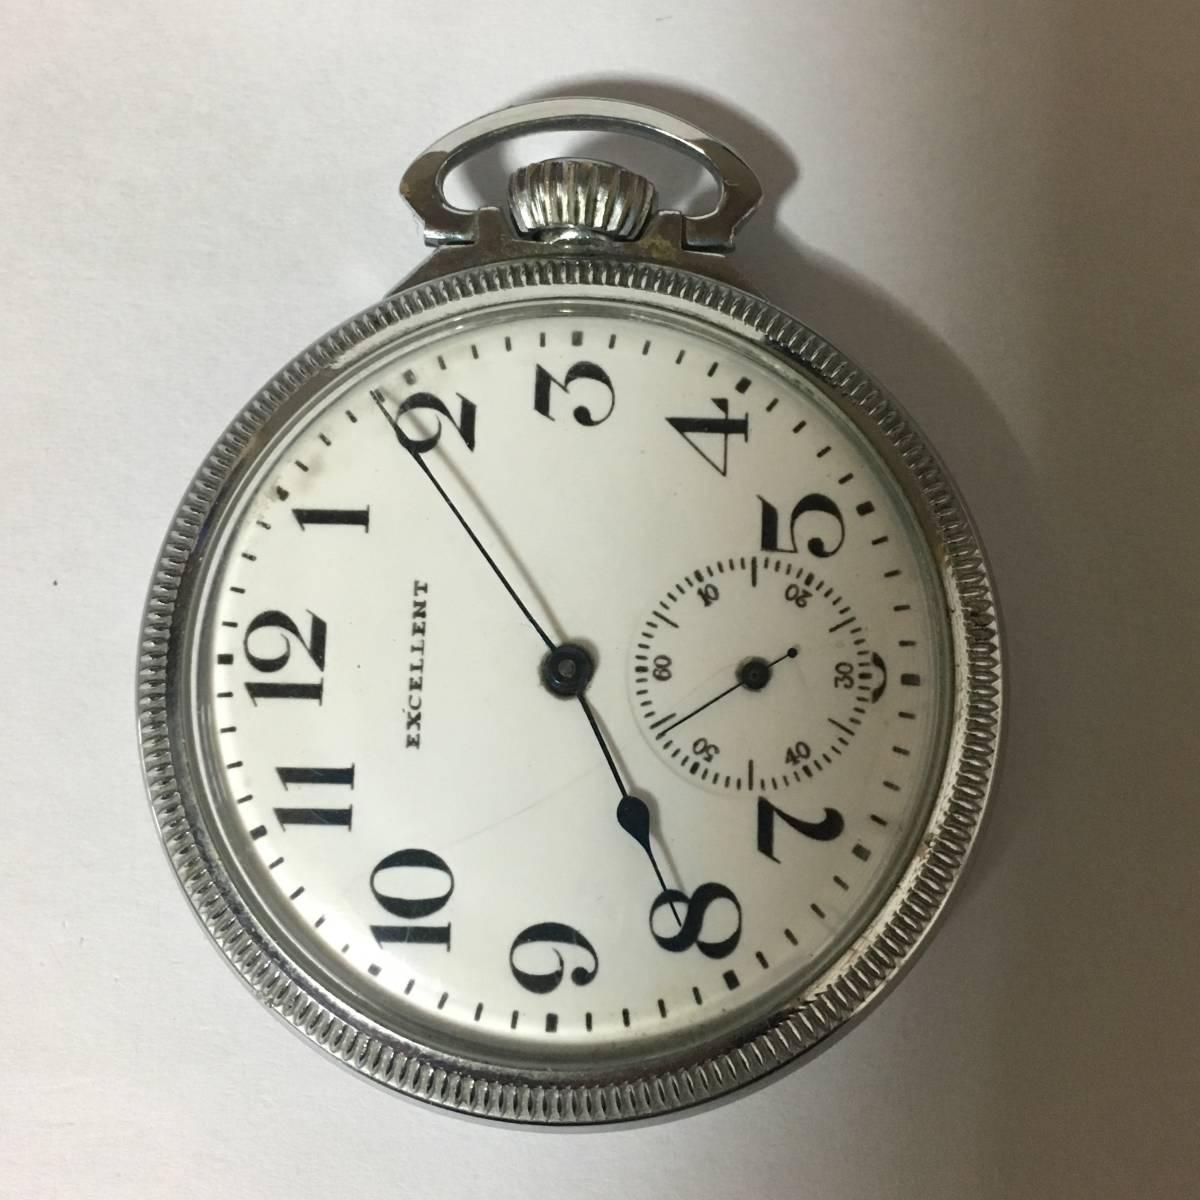 SEIKOSHA精工優秀卓越15石頭古董垃圾零件懷錶 編號:w273078117